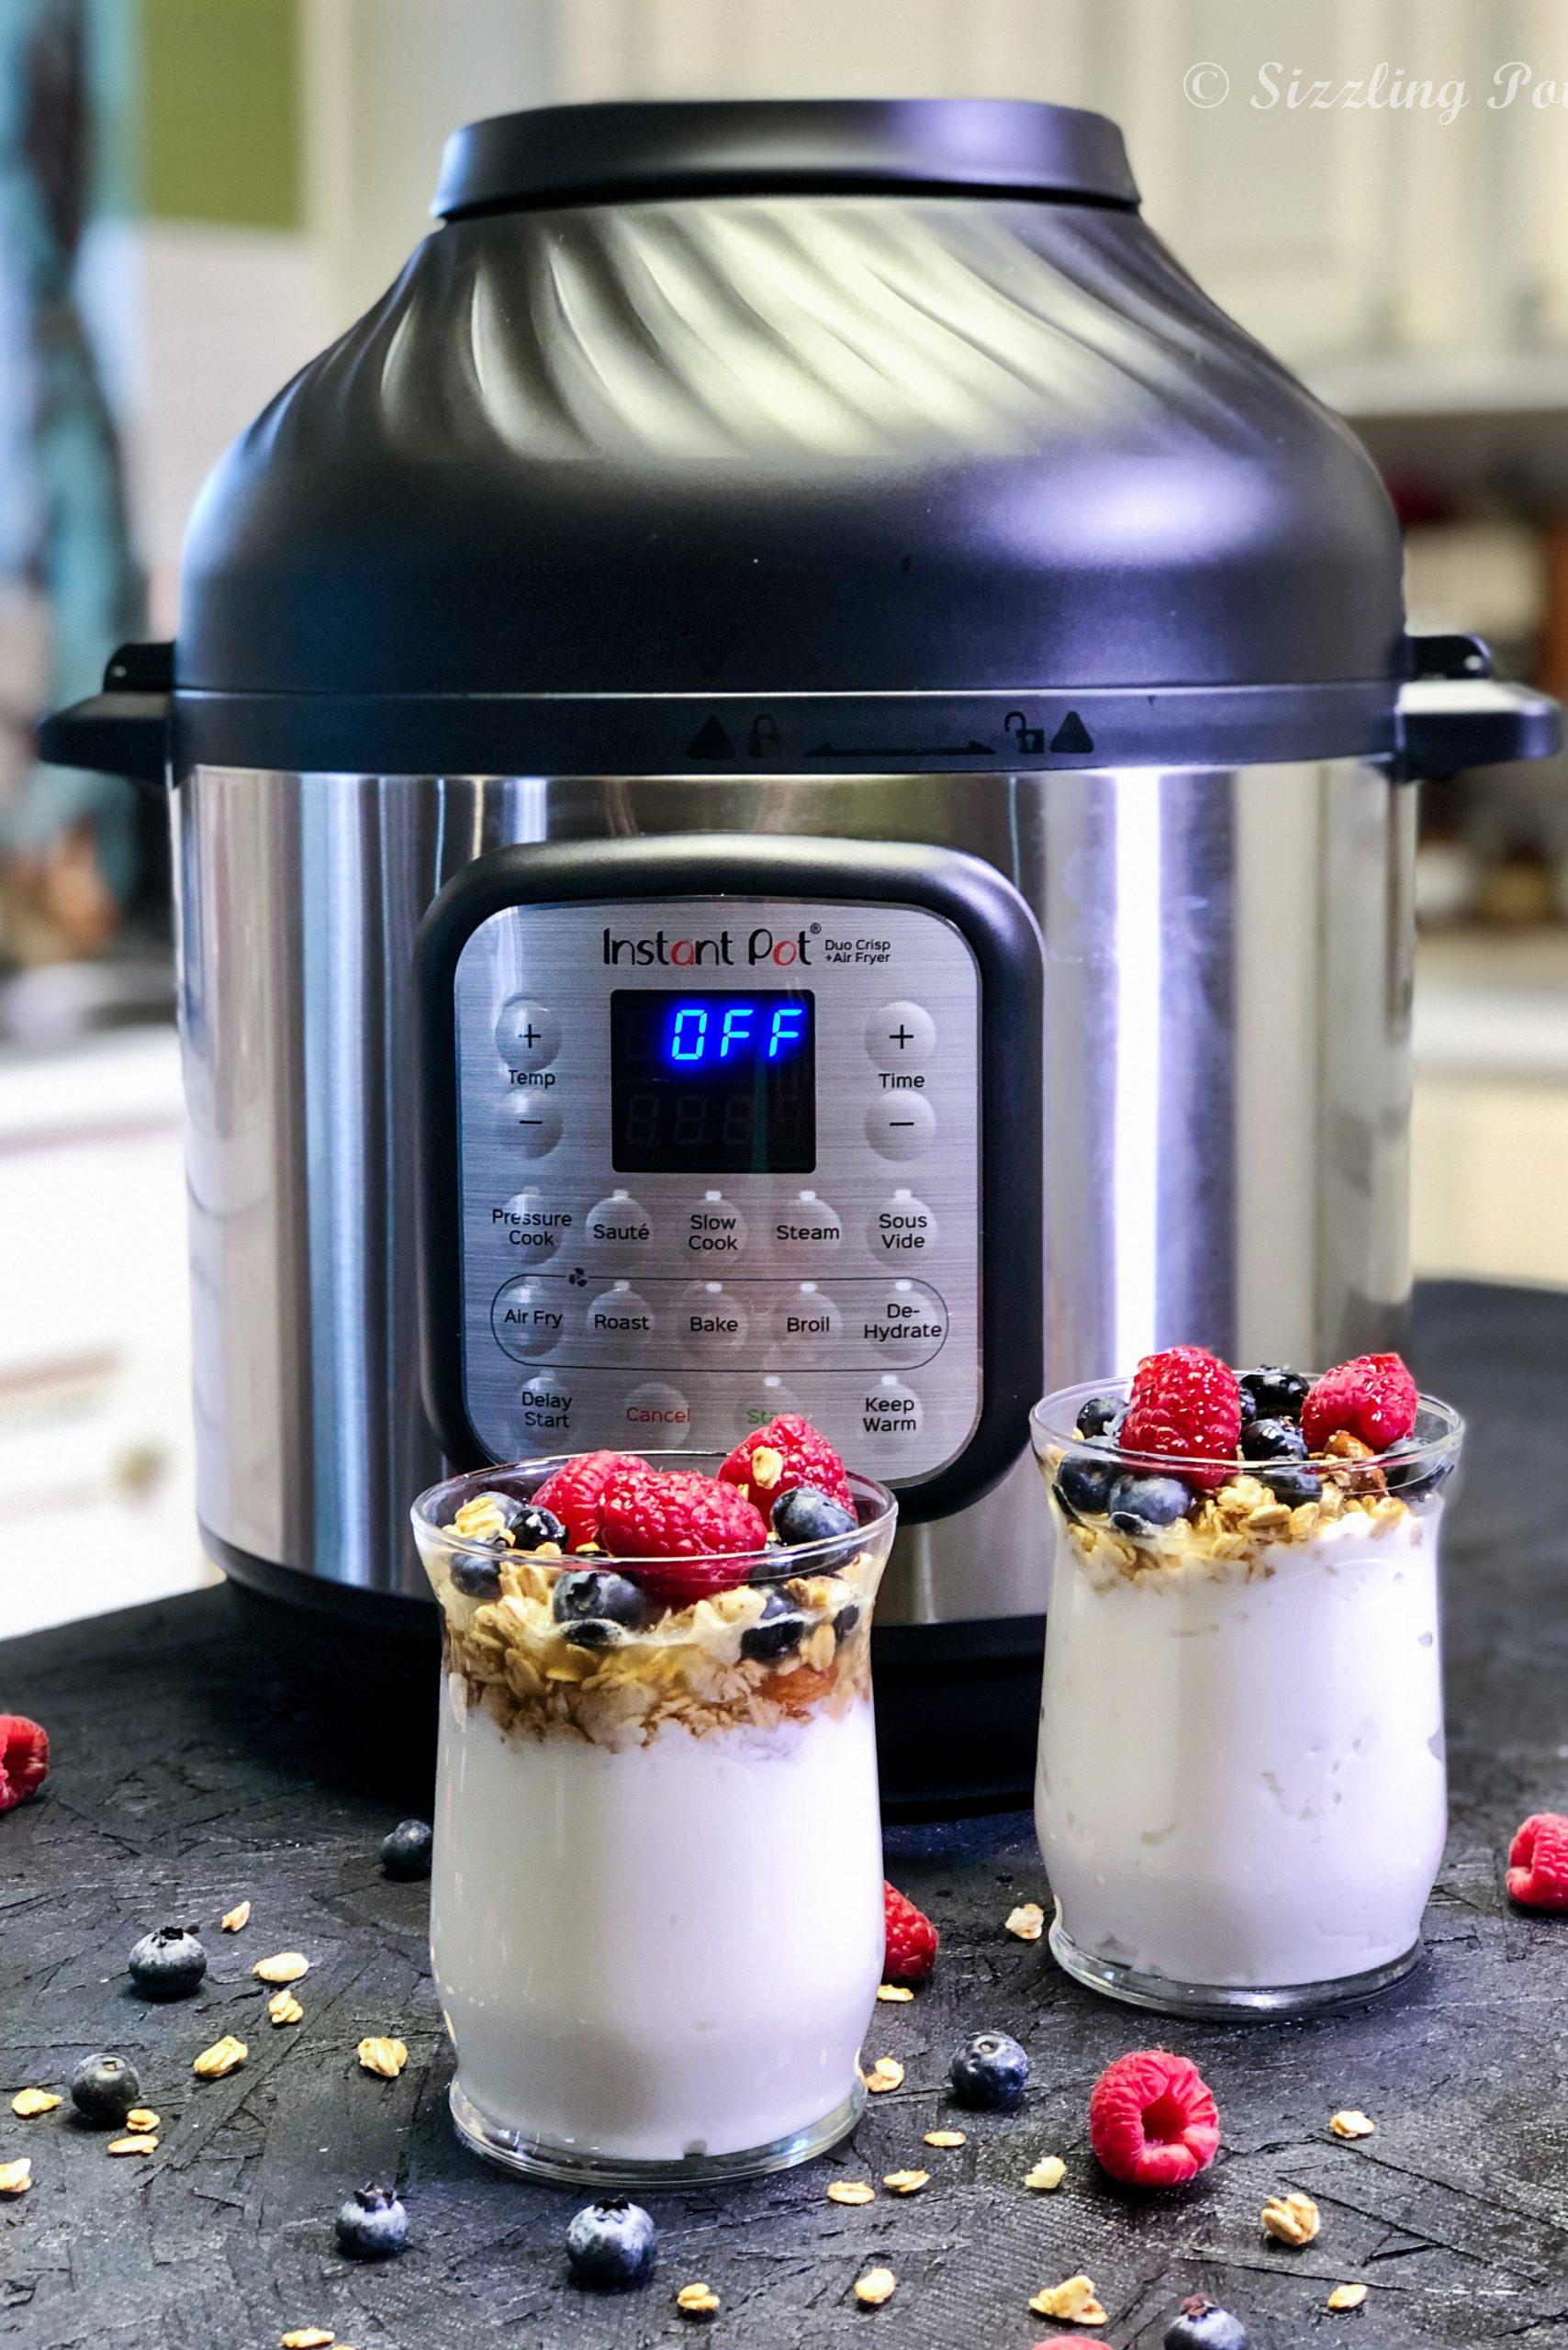 Instant Pot DUO Crisp Sous Vide Greek-Style Homemade Yogurt Recipe